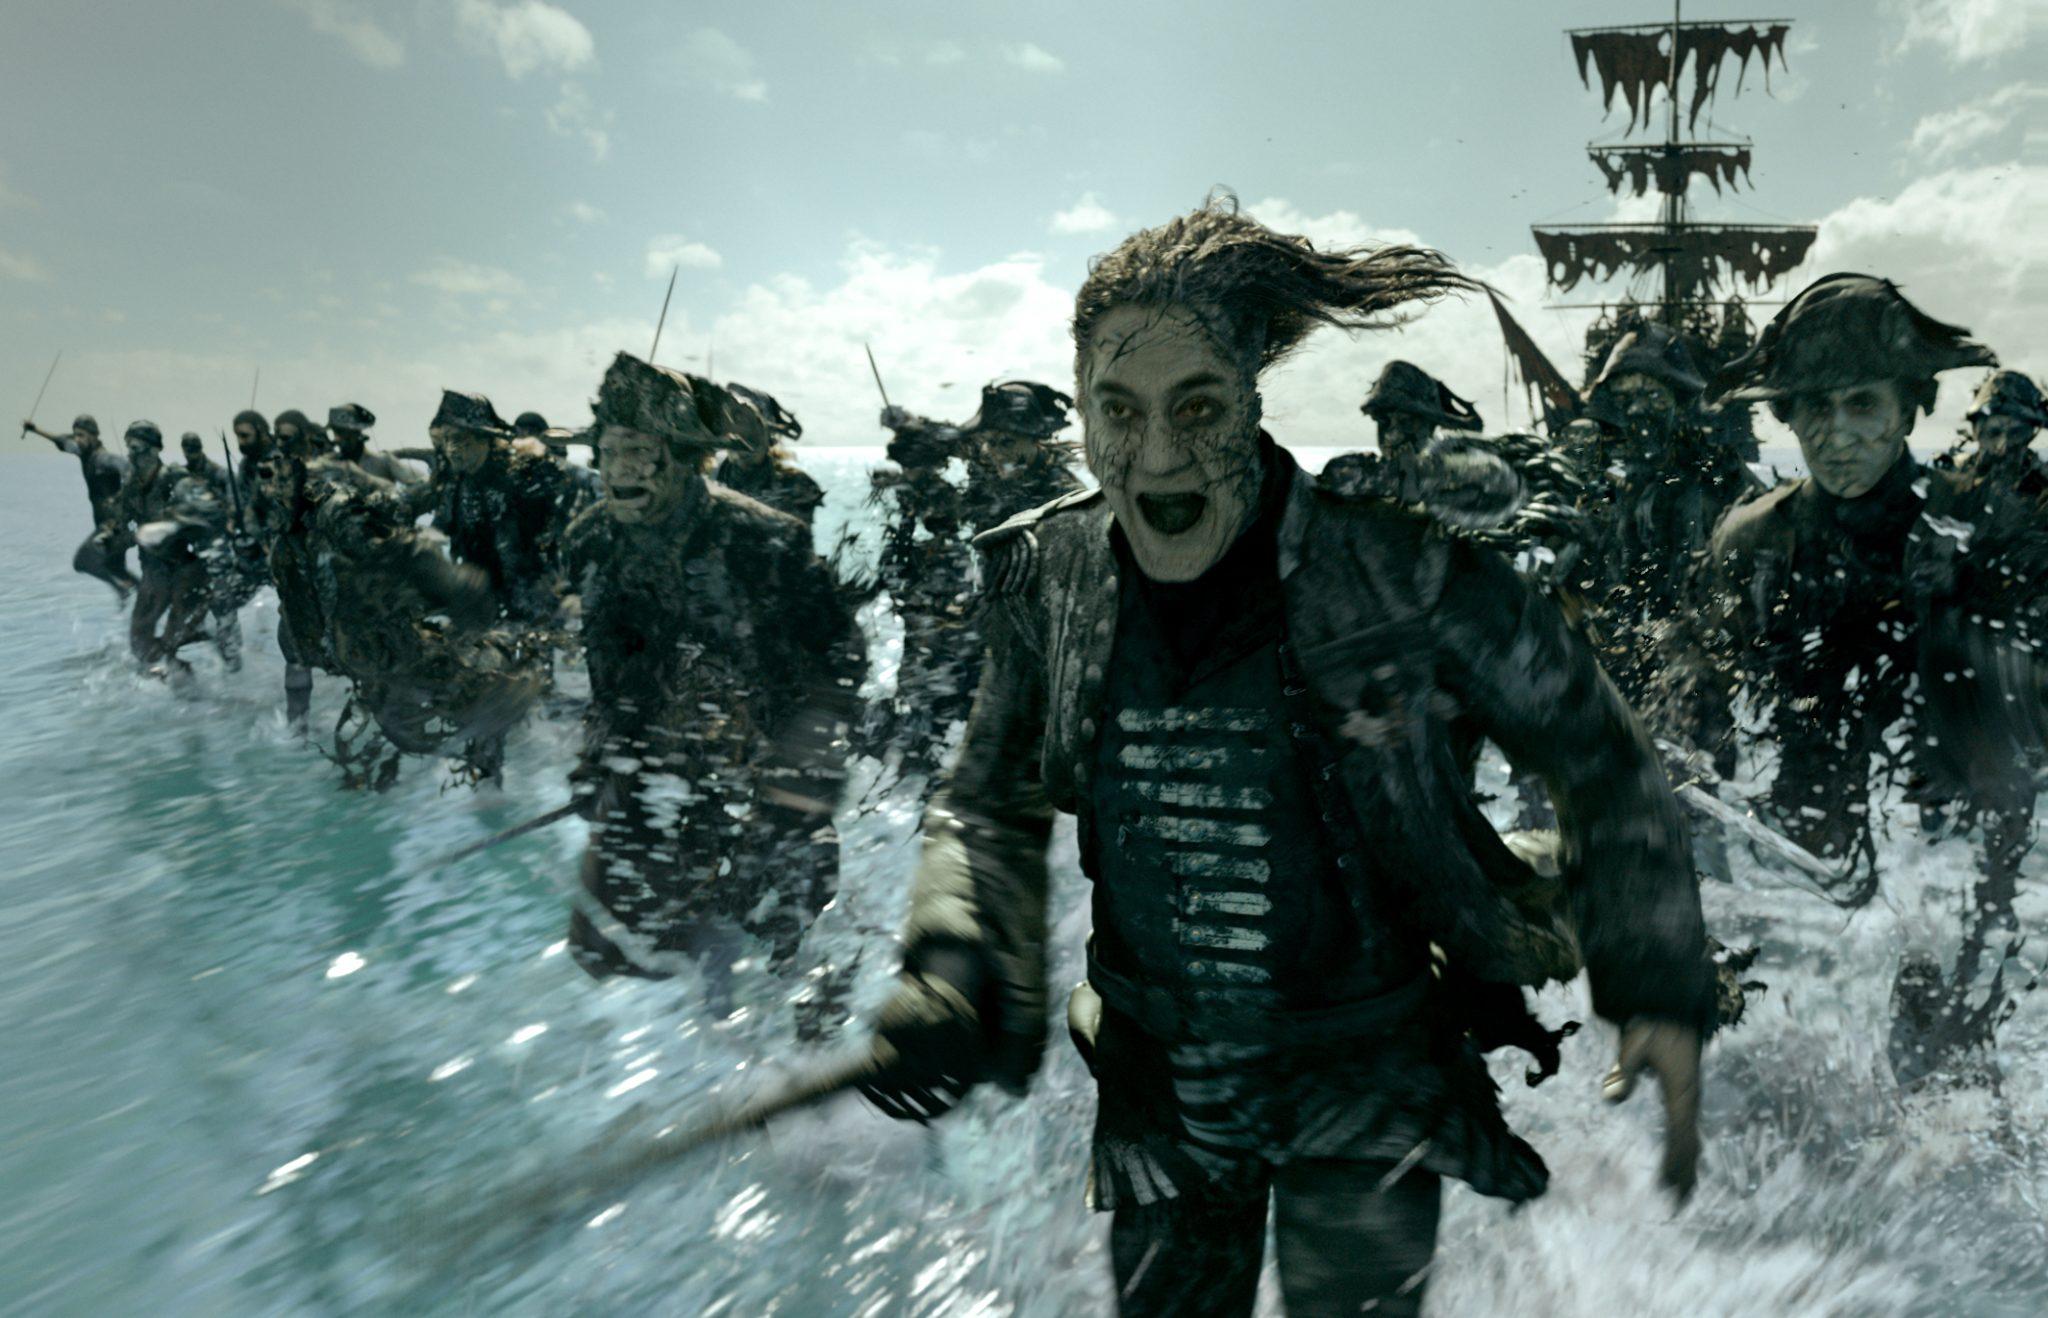 Pirates of the Caribbean Cast Interviews – Dead Men Tell No Tales